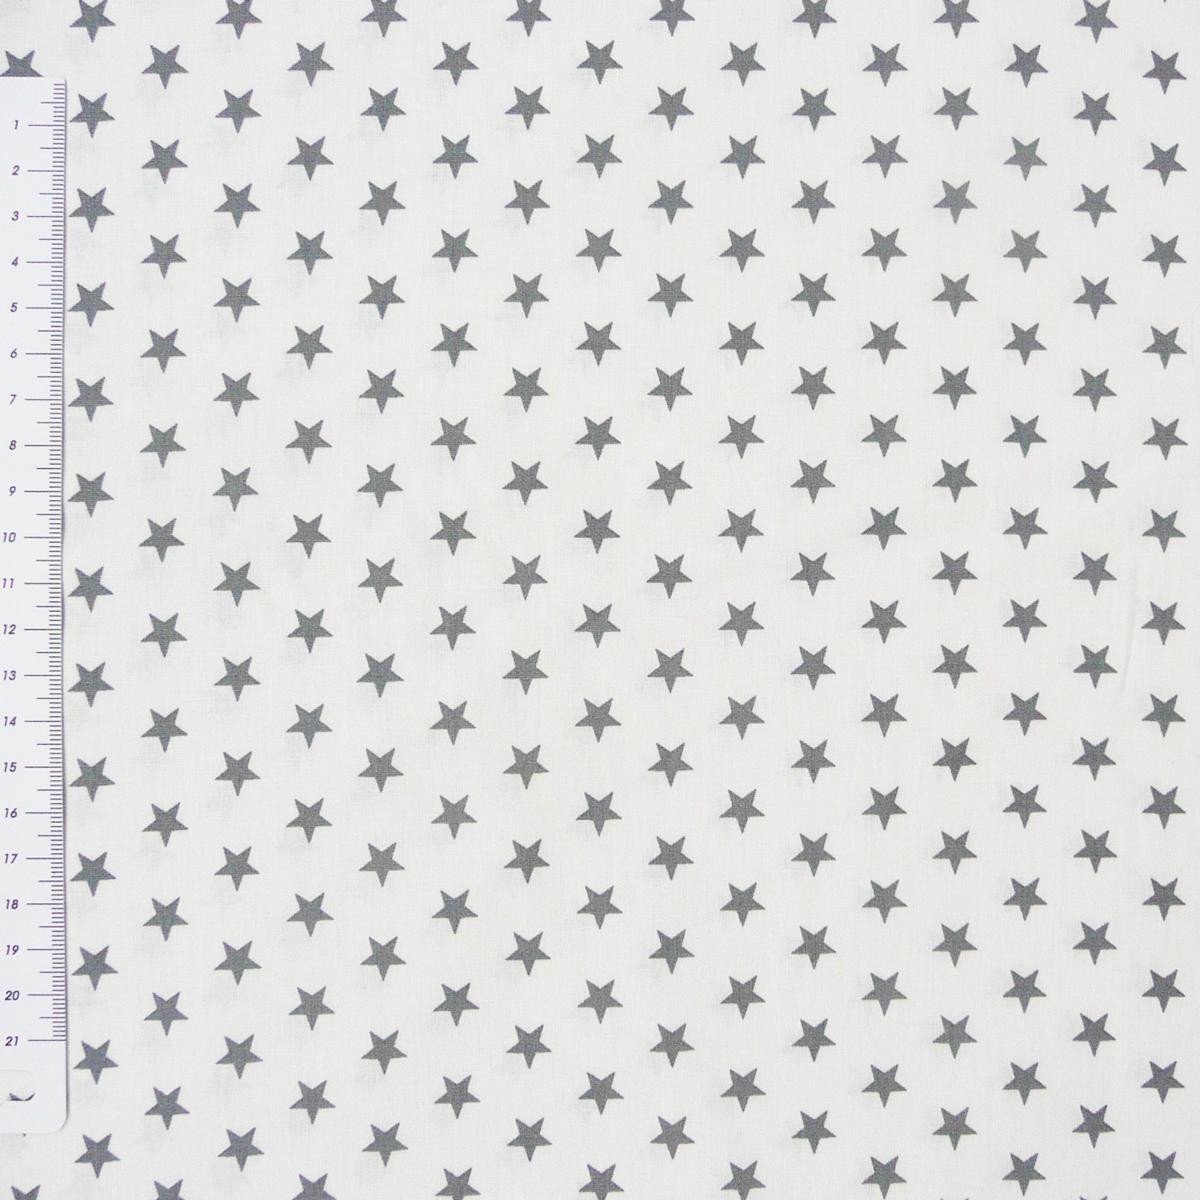 baumwollstoff sterne wei grau stoffe stoffe gemustert stoff sterne. Black Bedroom Furniture Sets. Home Design Ideas